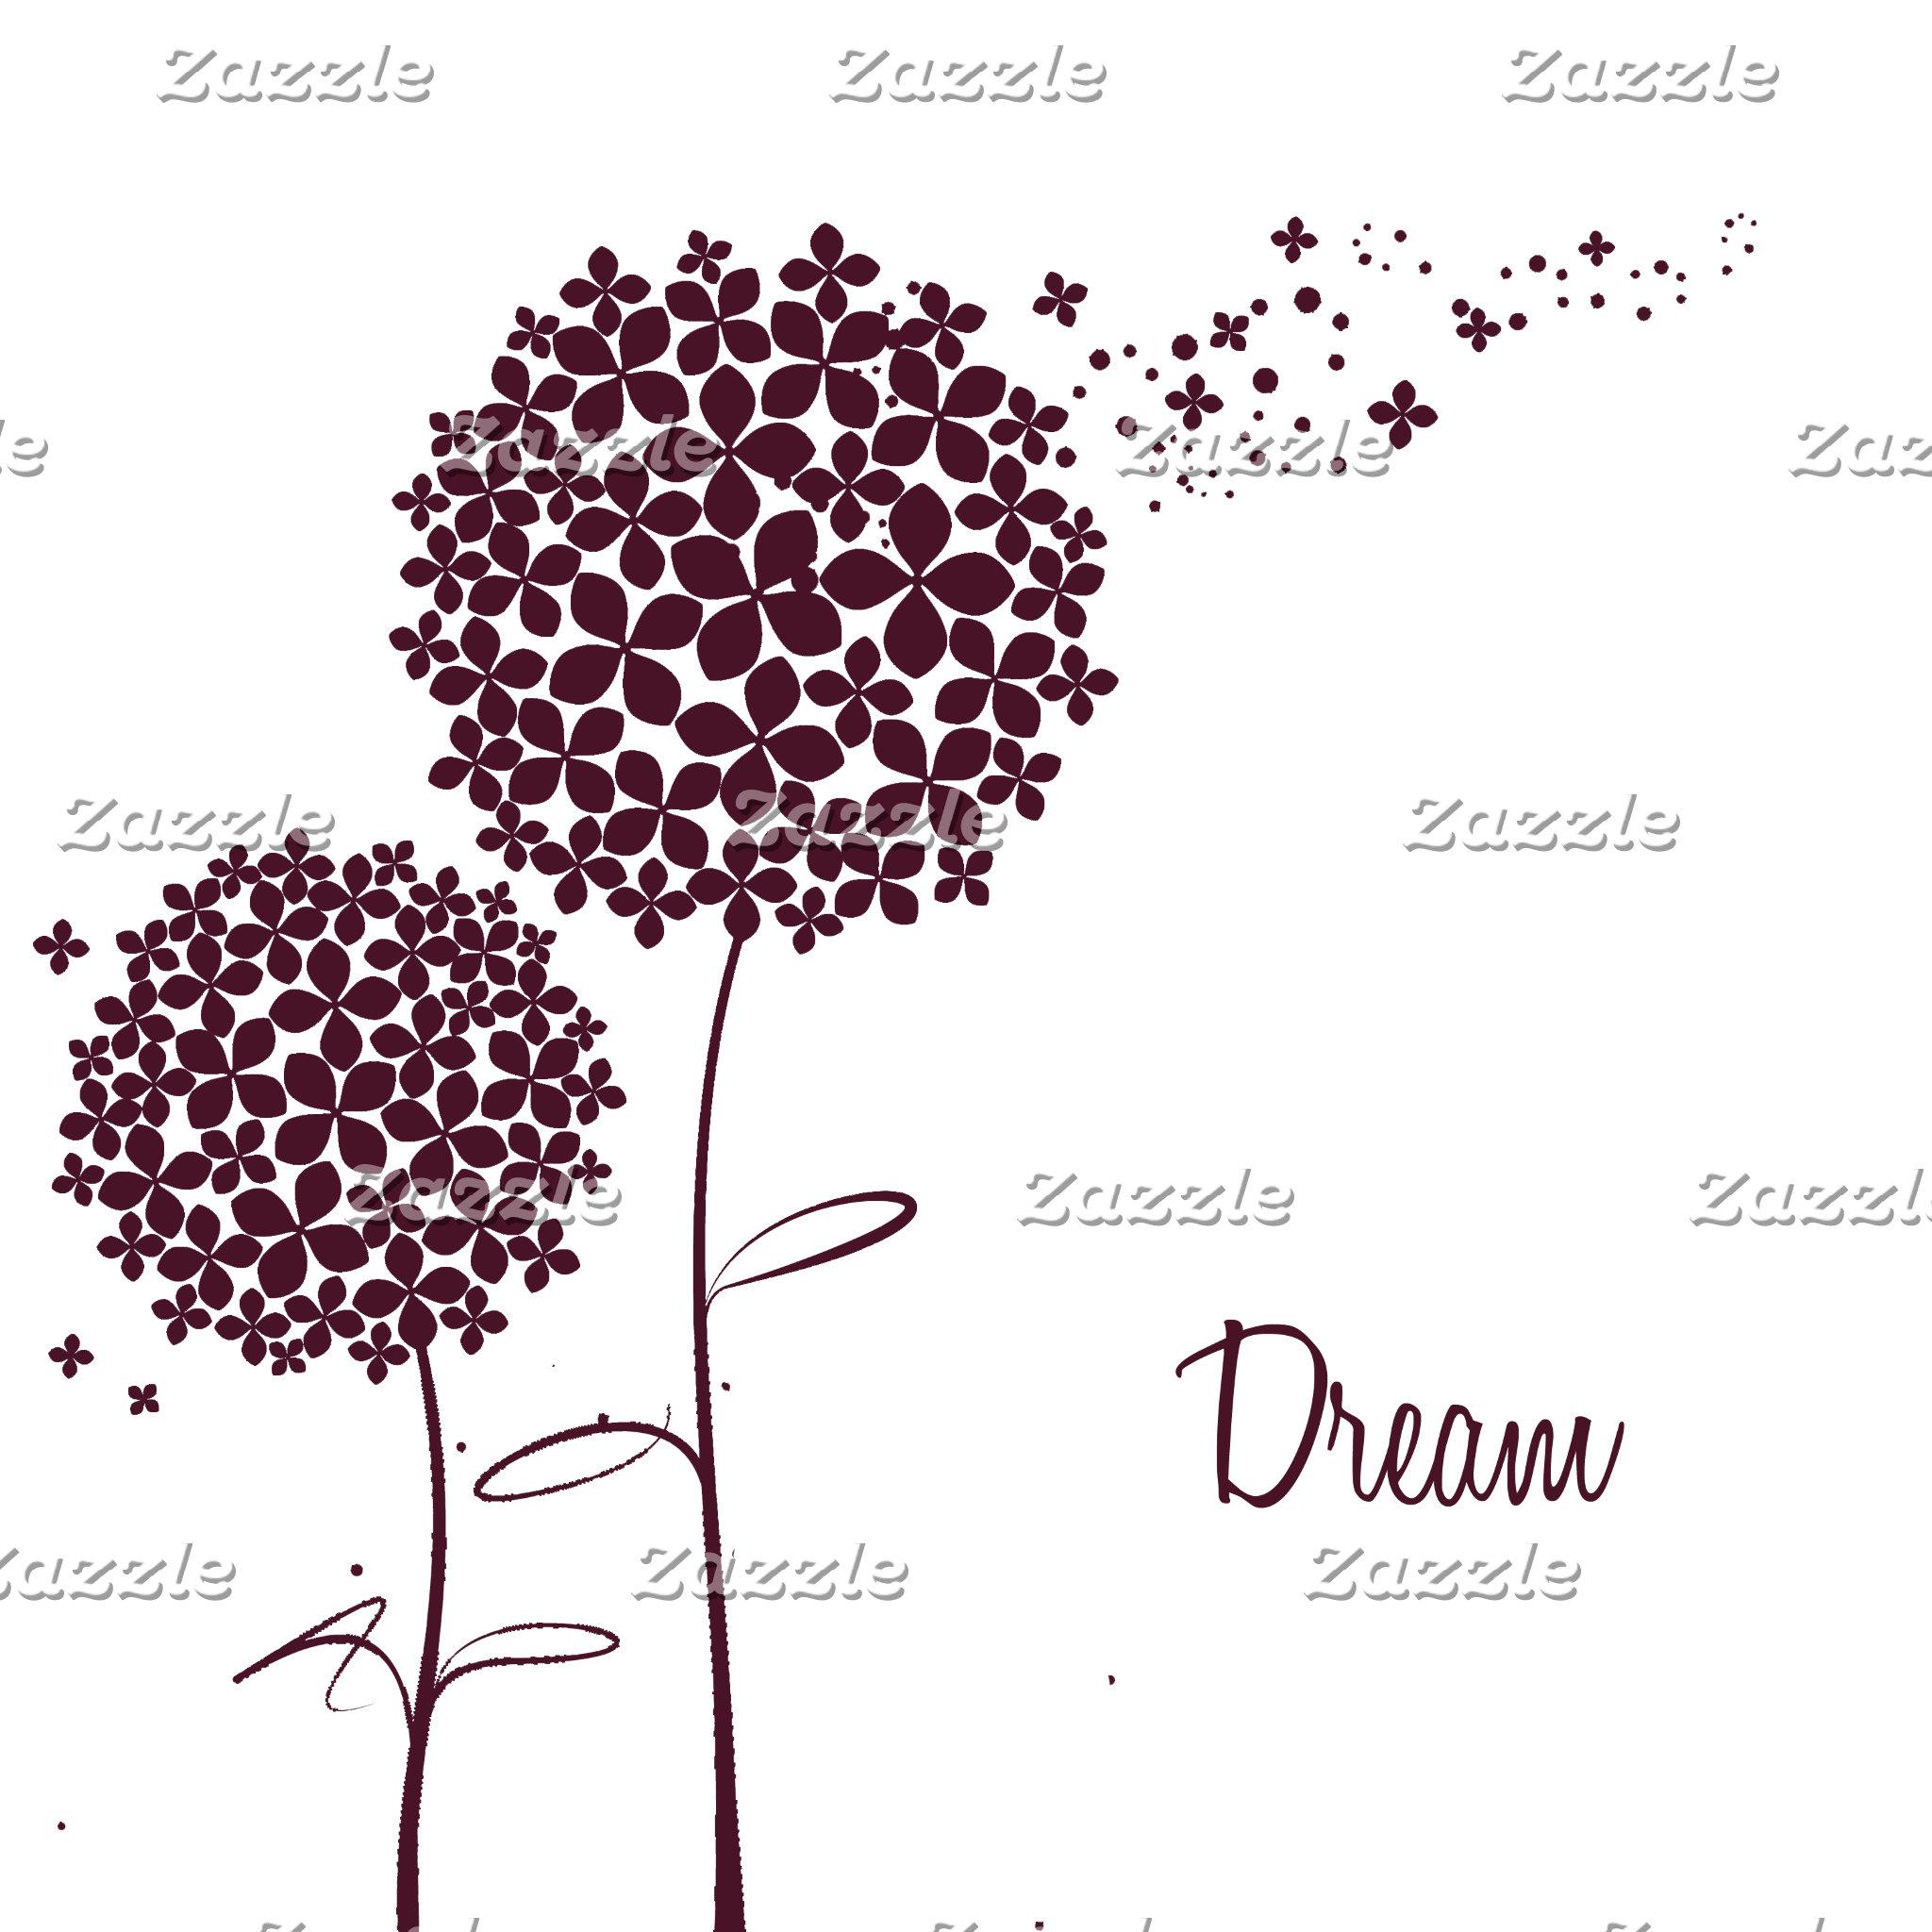 Dream Dandelions